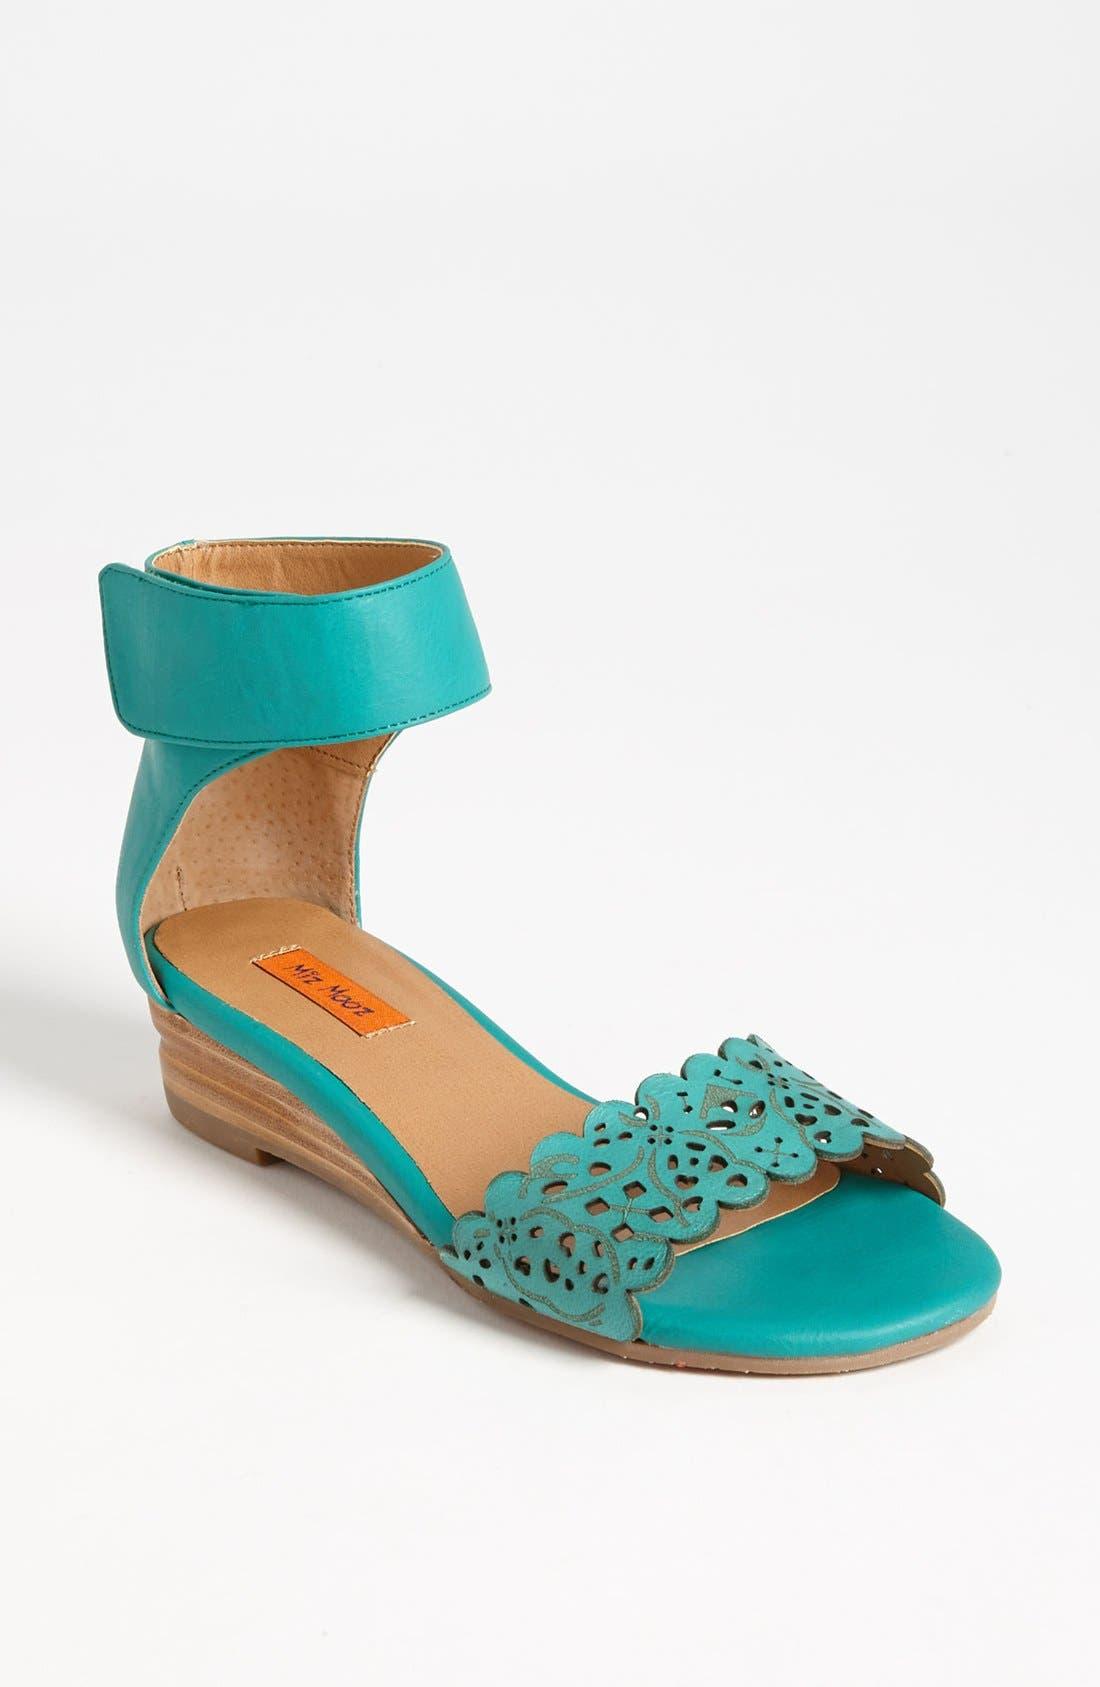 Alternate Image 1 Selected - Miz Mooz 'Primrose' Sandal